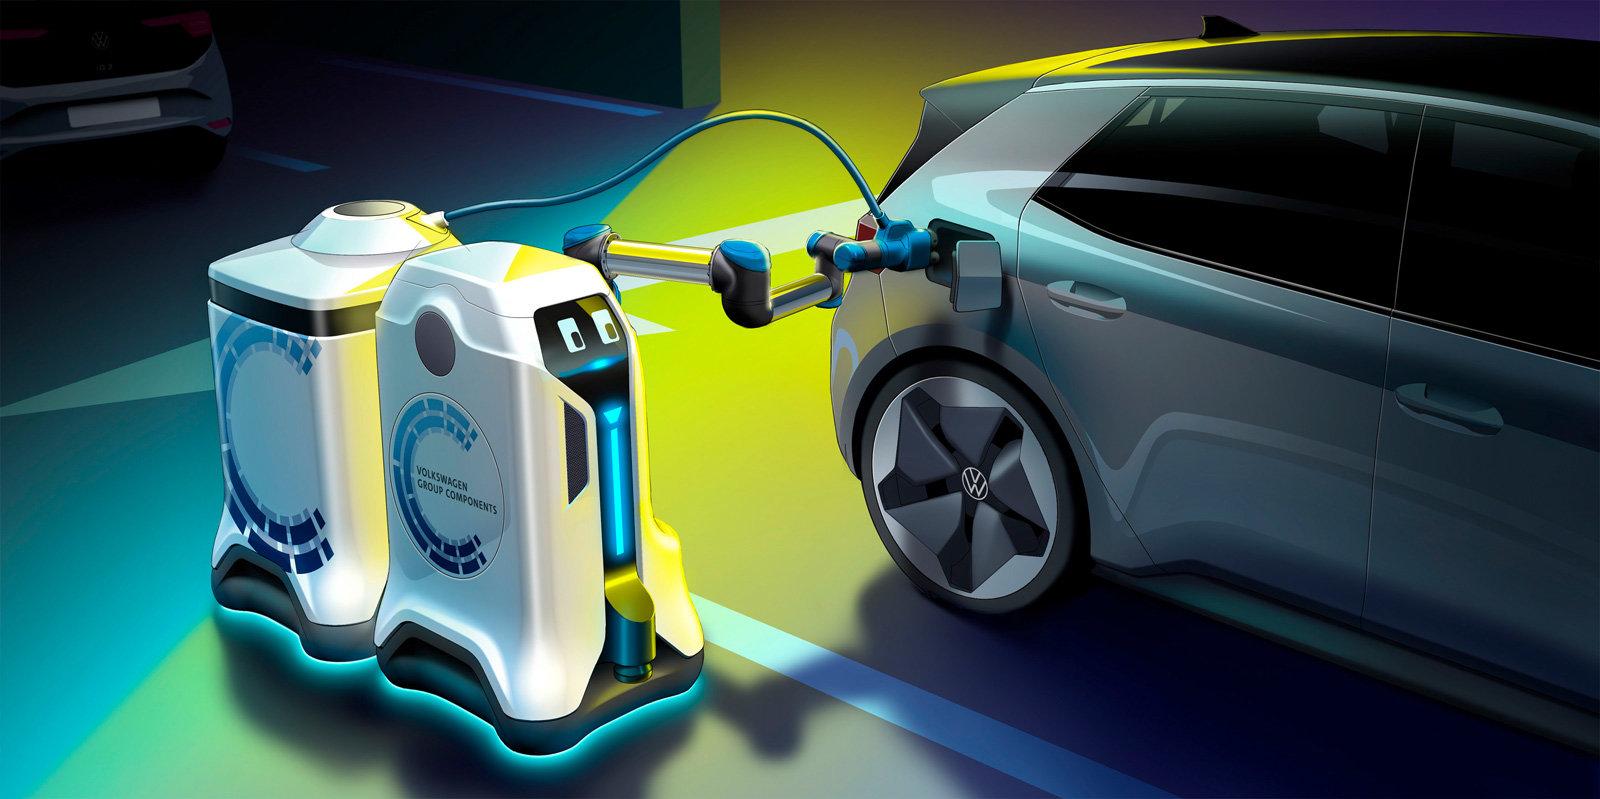 робот для зарядки электромобиля